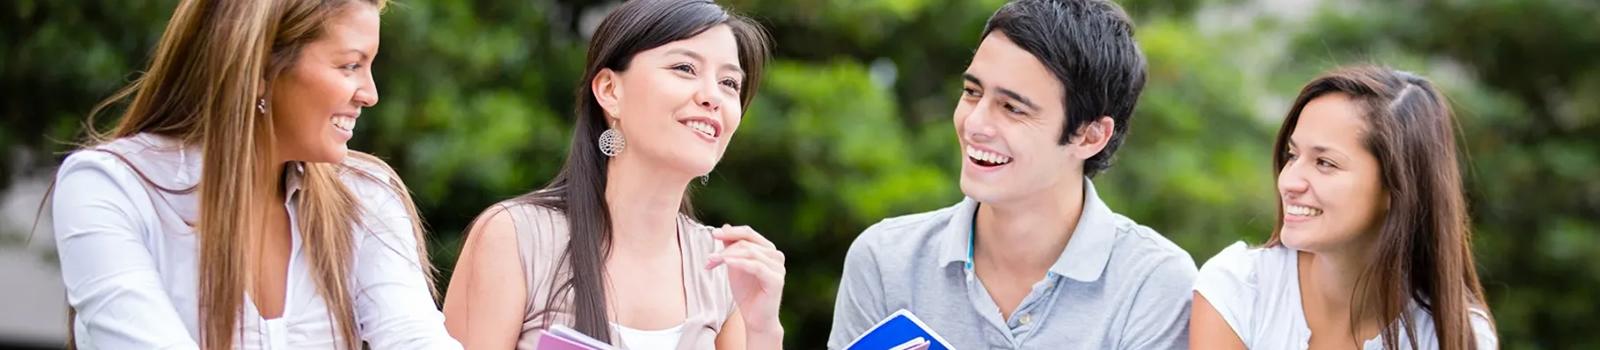 Trung Học Online 4.0